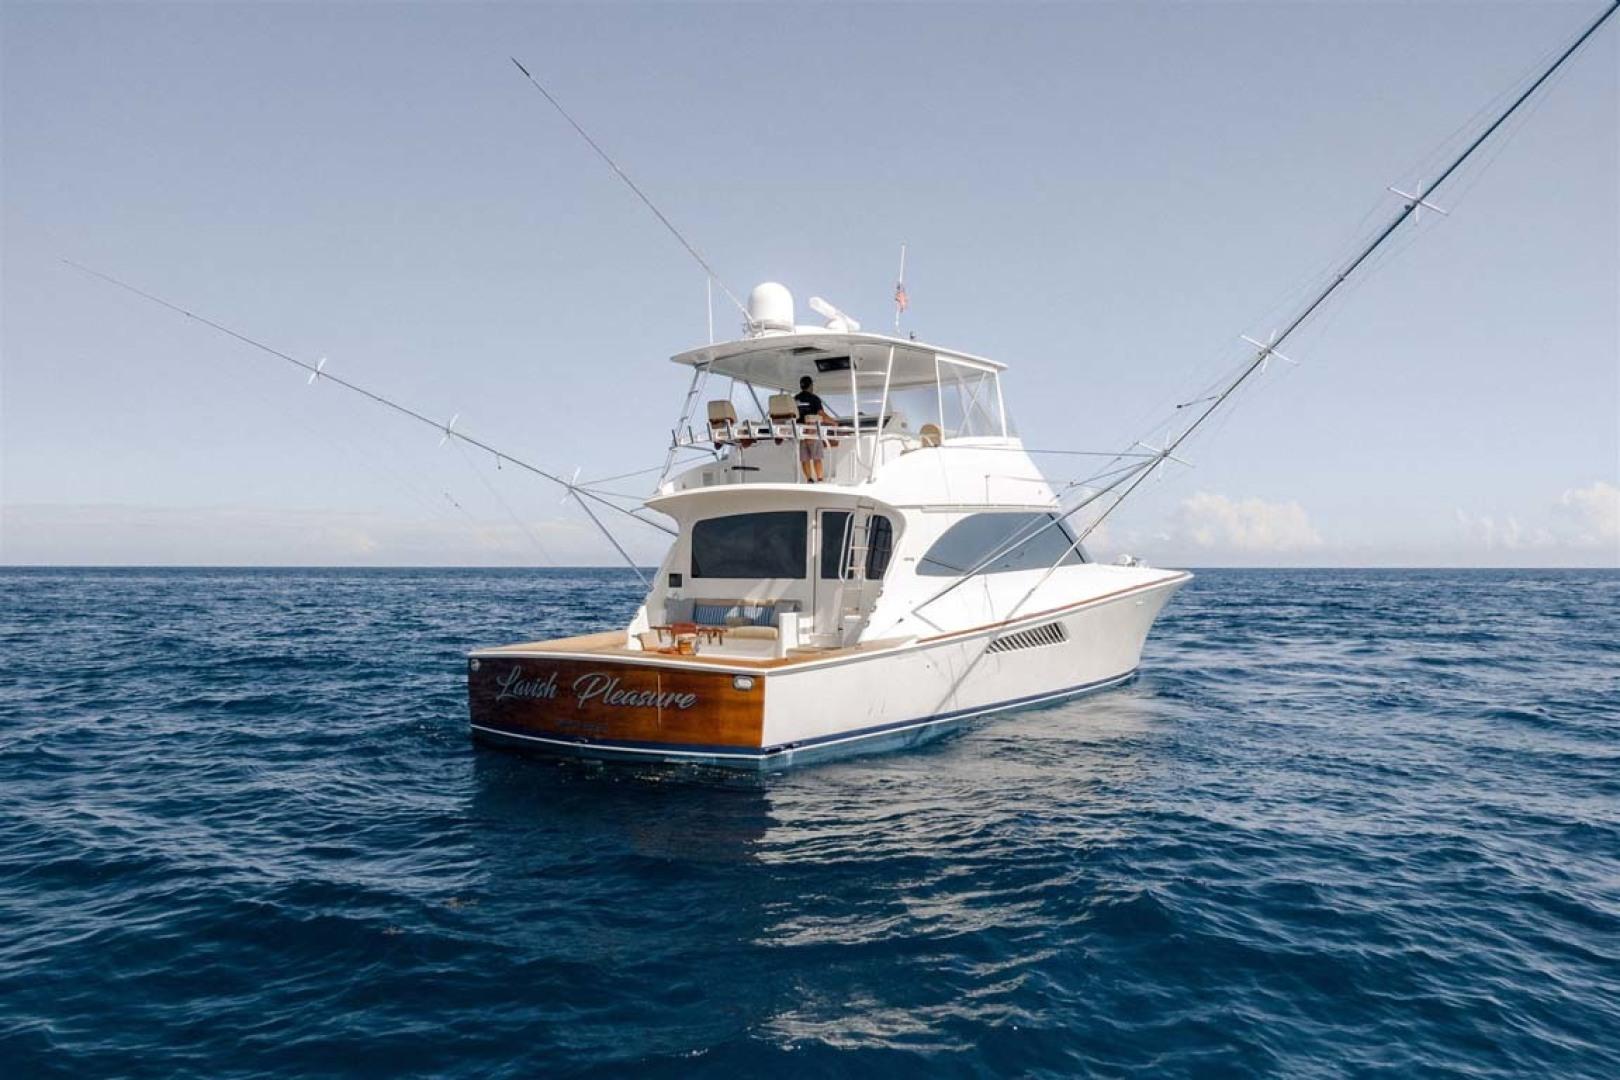 Viking-Convertible 2009-Lavish Pleasure North Miami-Florida-United States-1627624 | Thumbnail